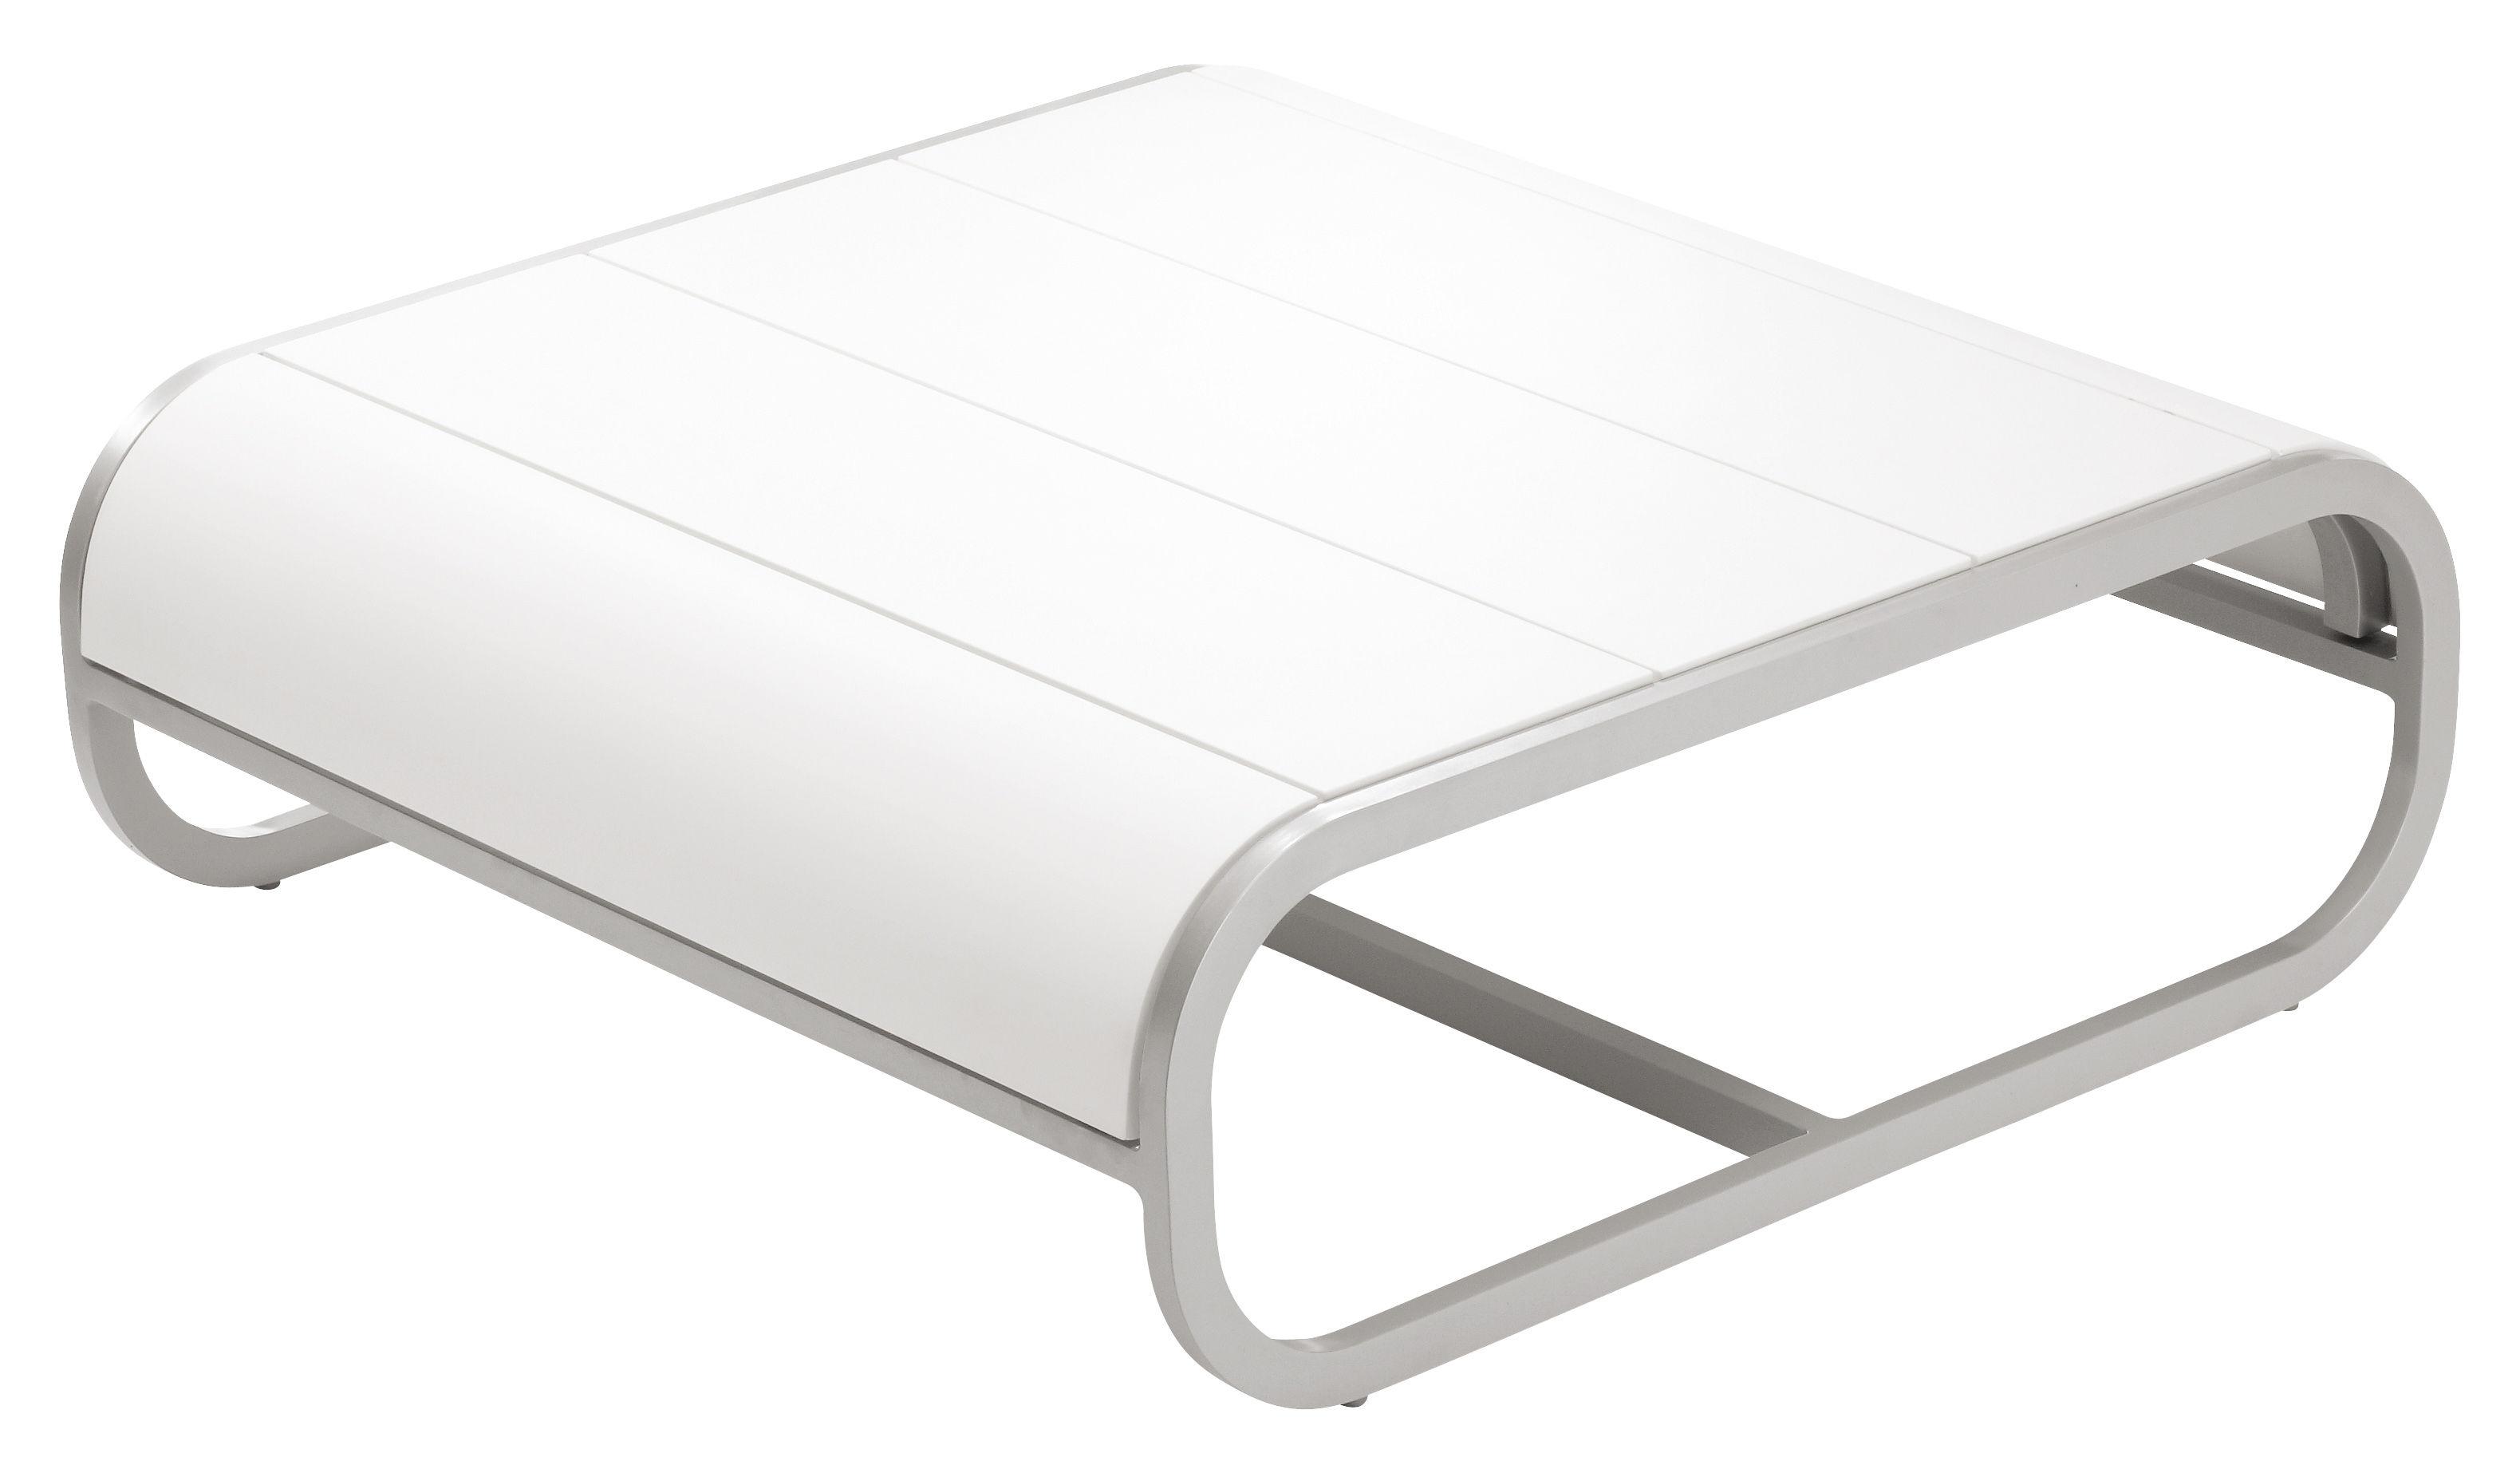 Mobilier - Tables basses - Table basse Tandem version corian - EGO Paris - Corian blanc - Aluminium laqué, Corian